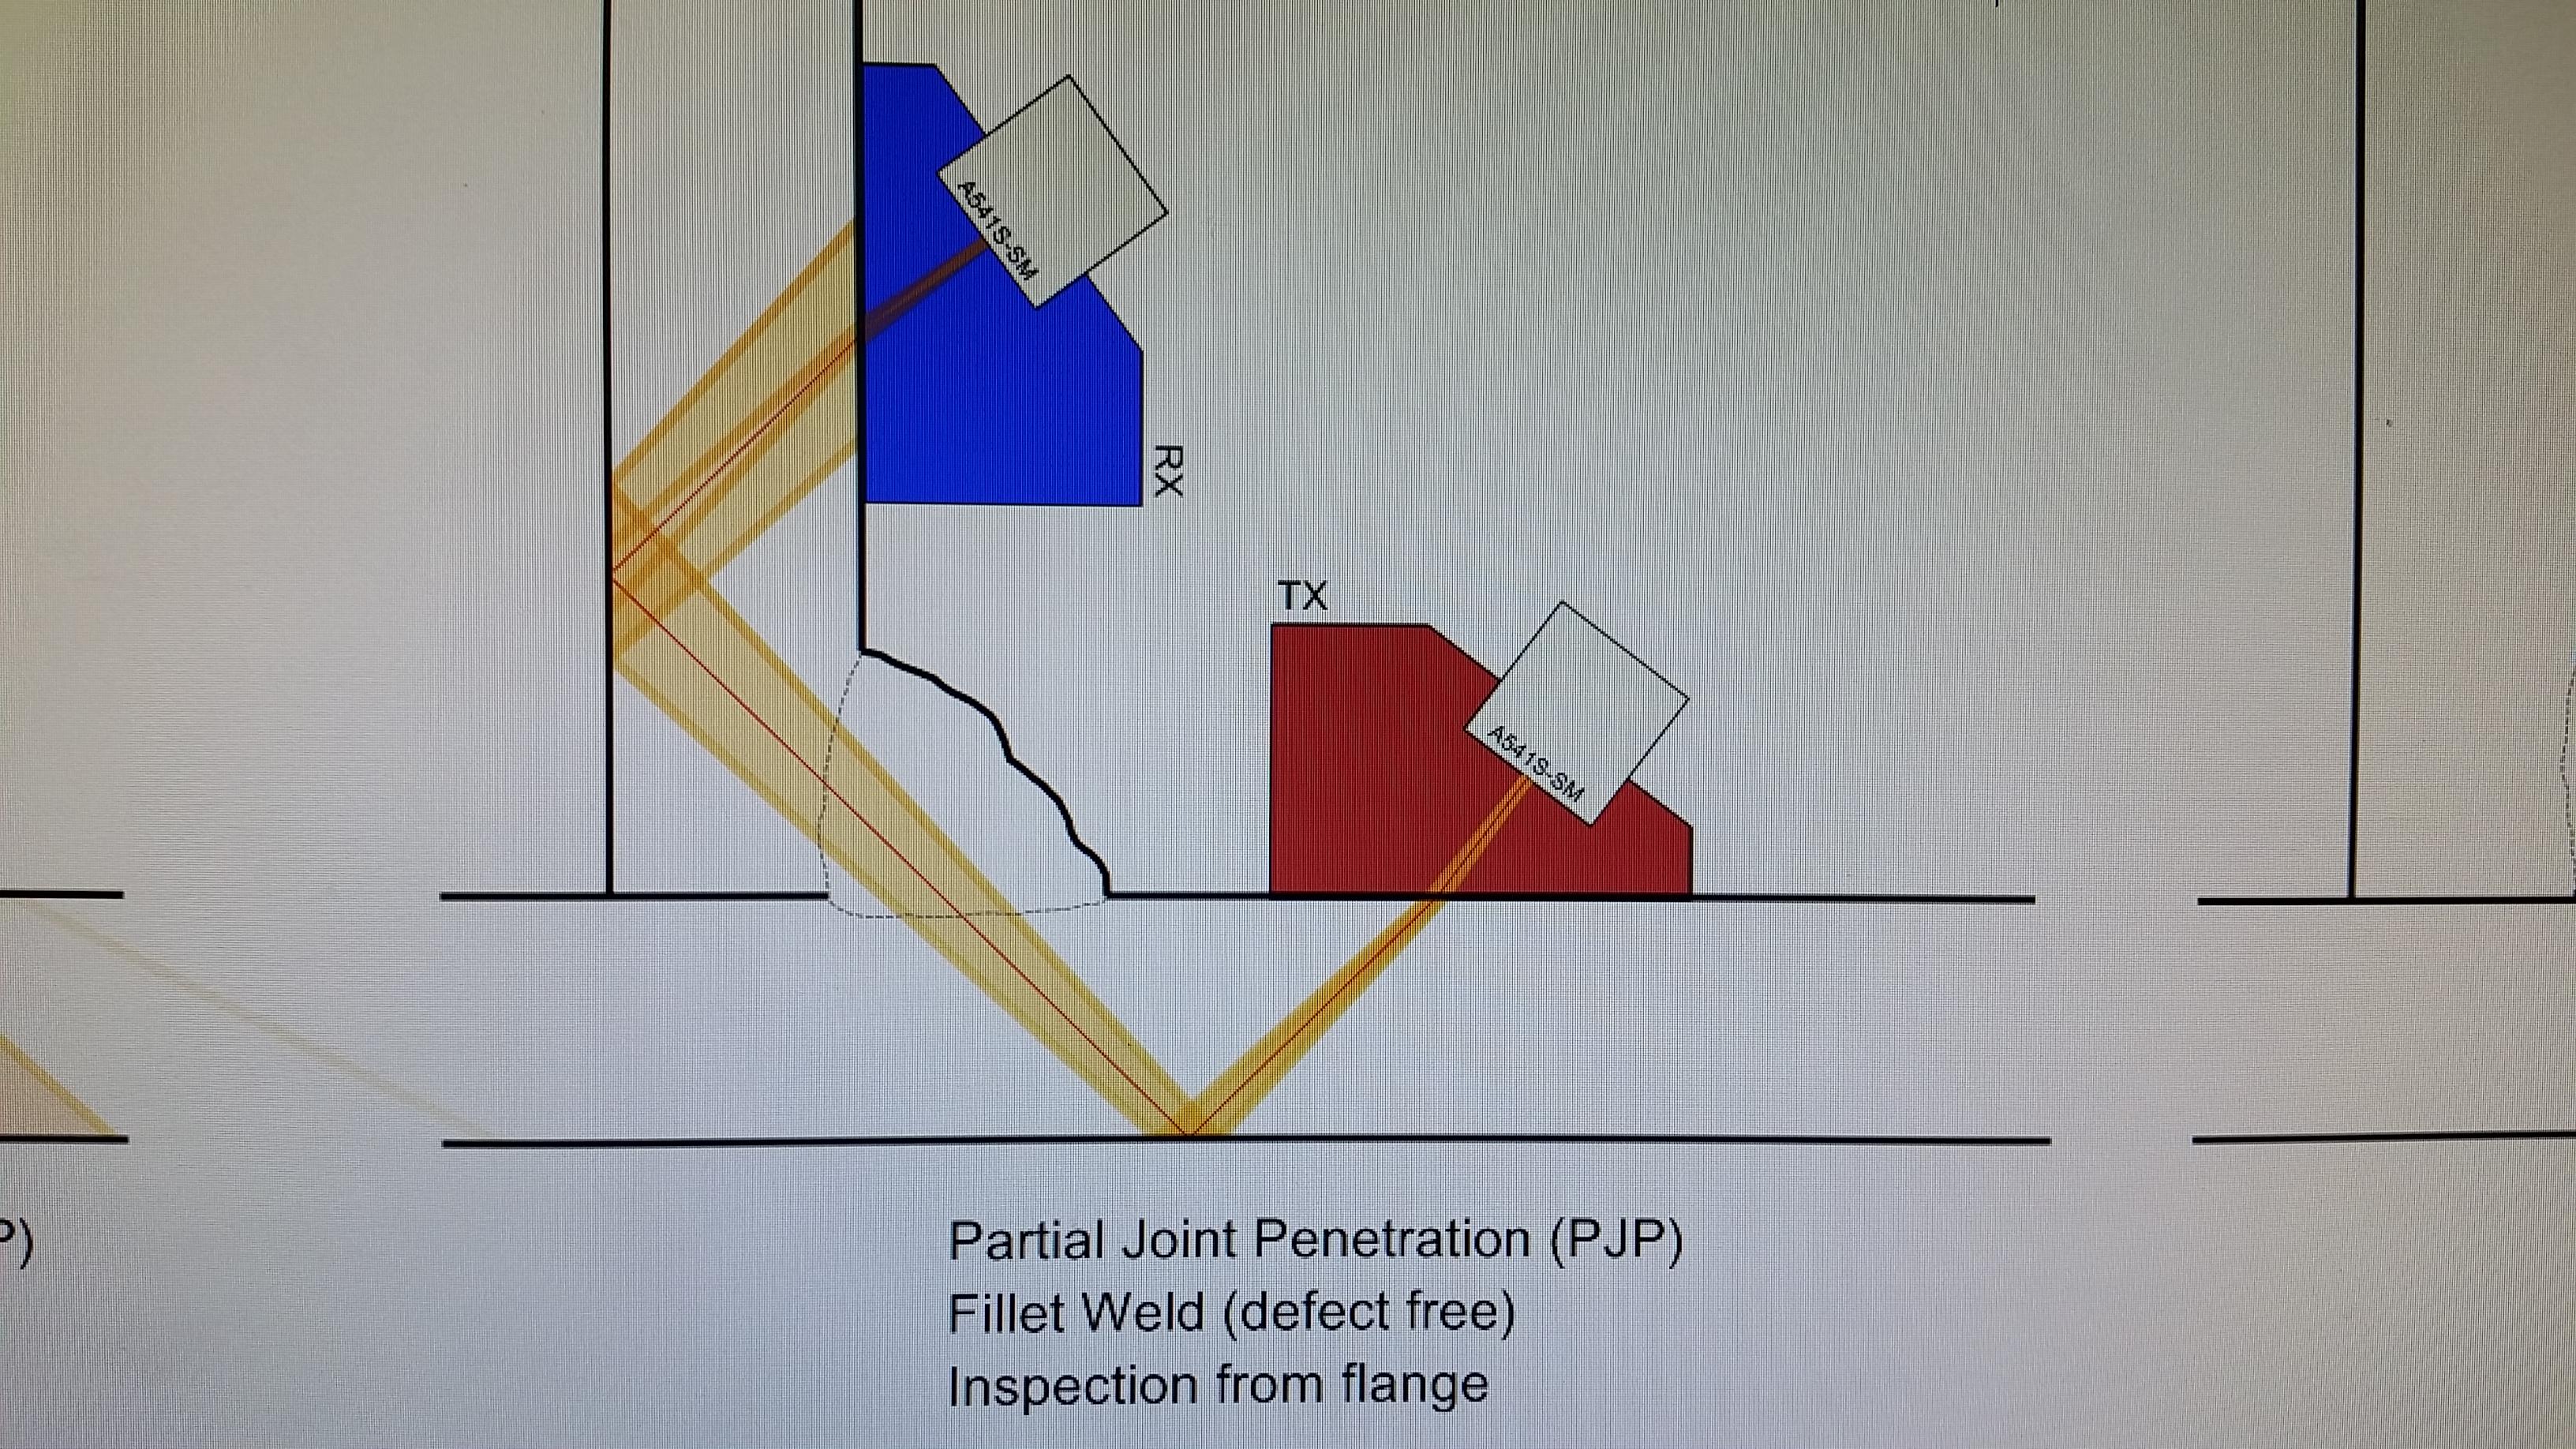 Ultrasonic Testing Of Fillet Weld Welding Defects Diagram Zoom